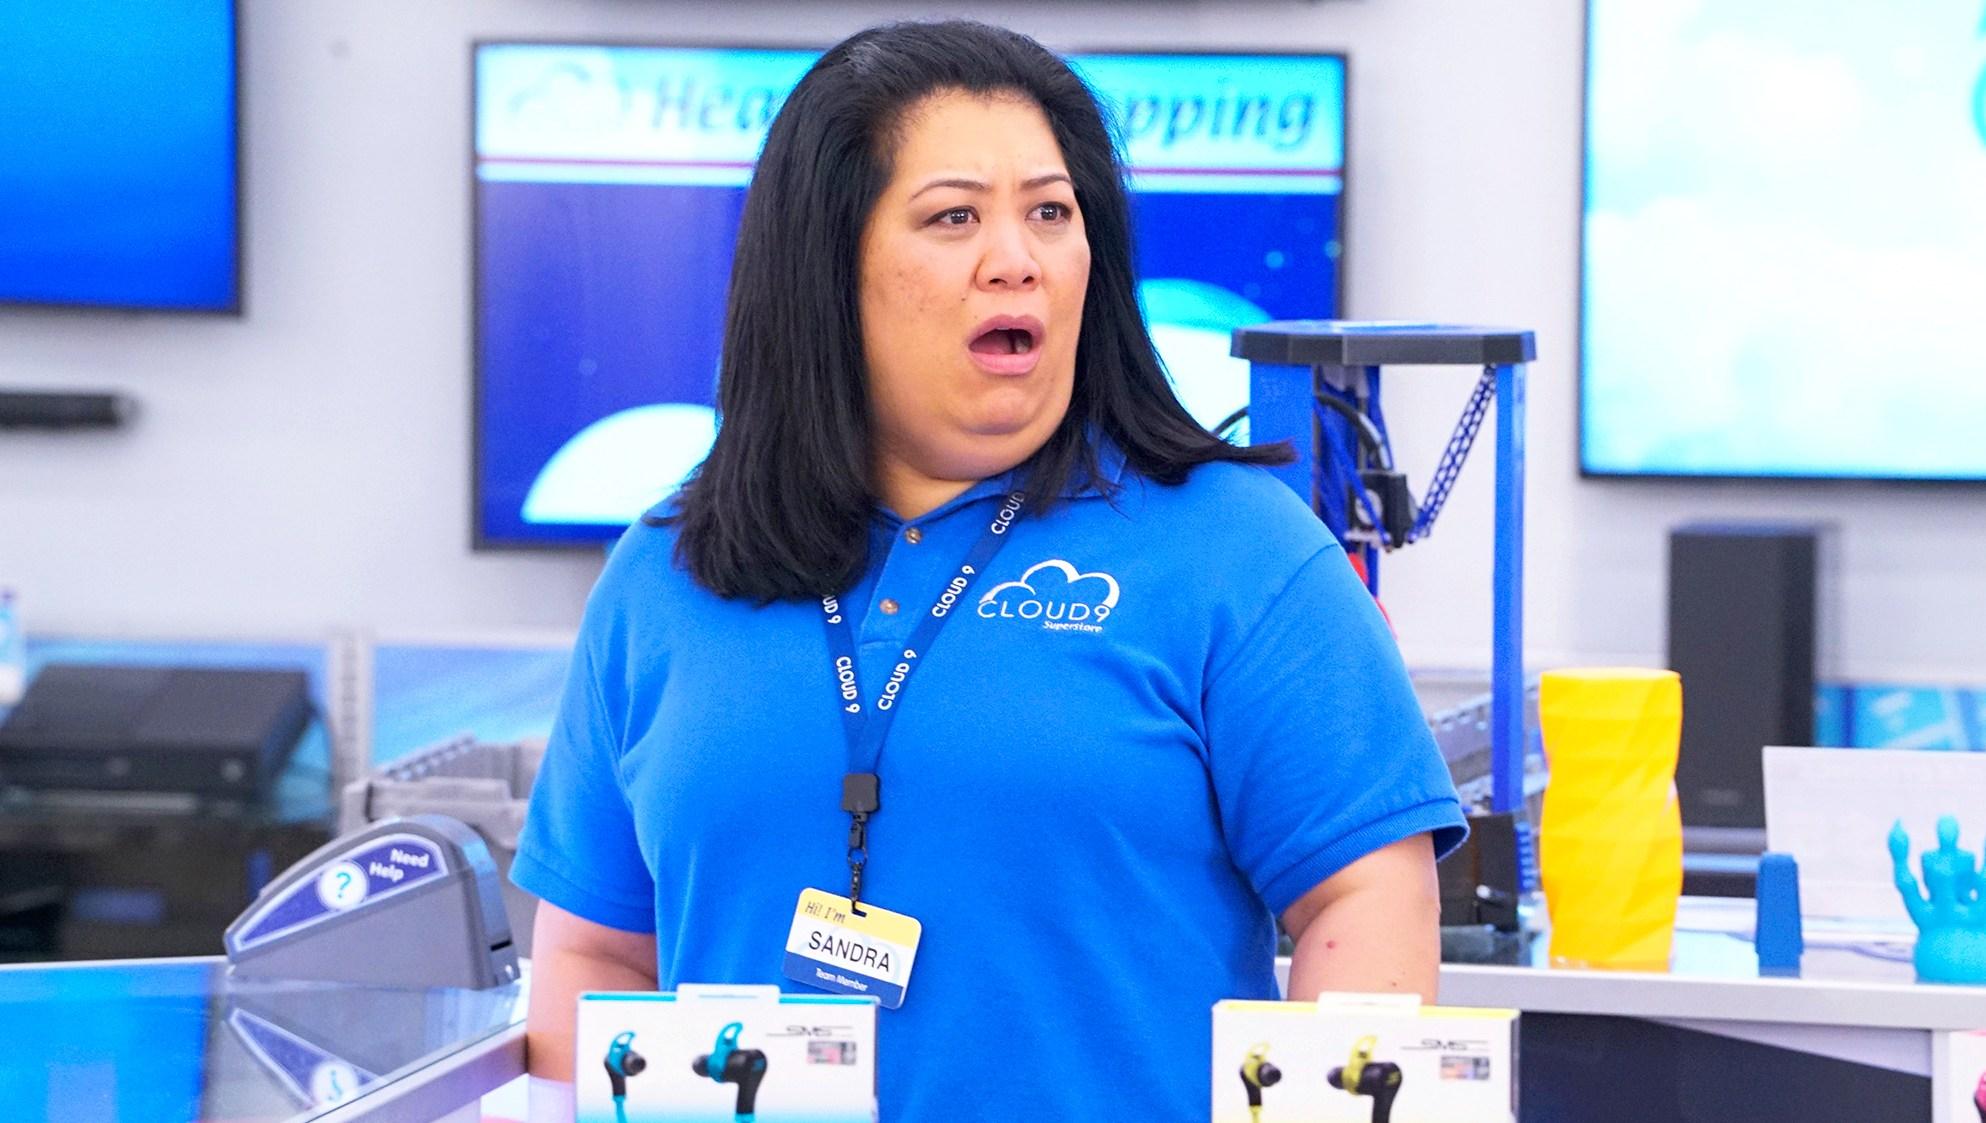 Kaliko Kauahi as Sandra on 'Superstore'